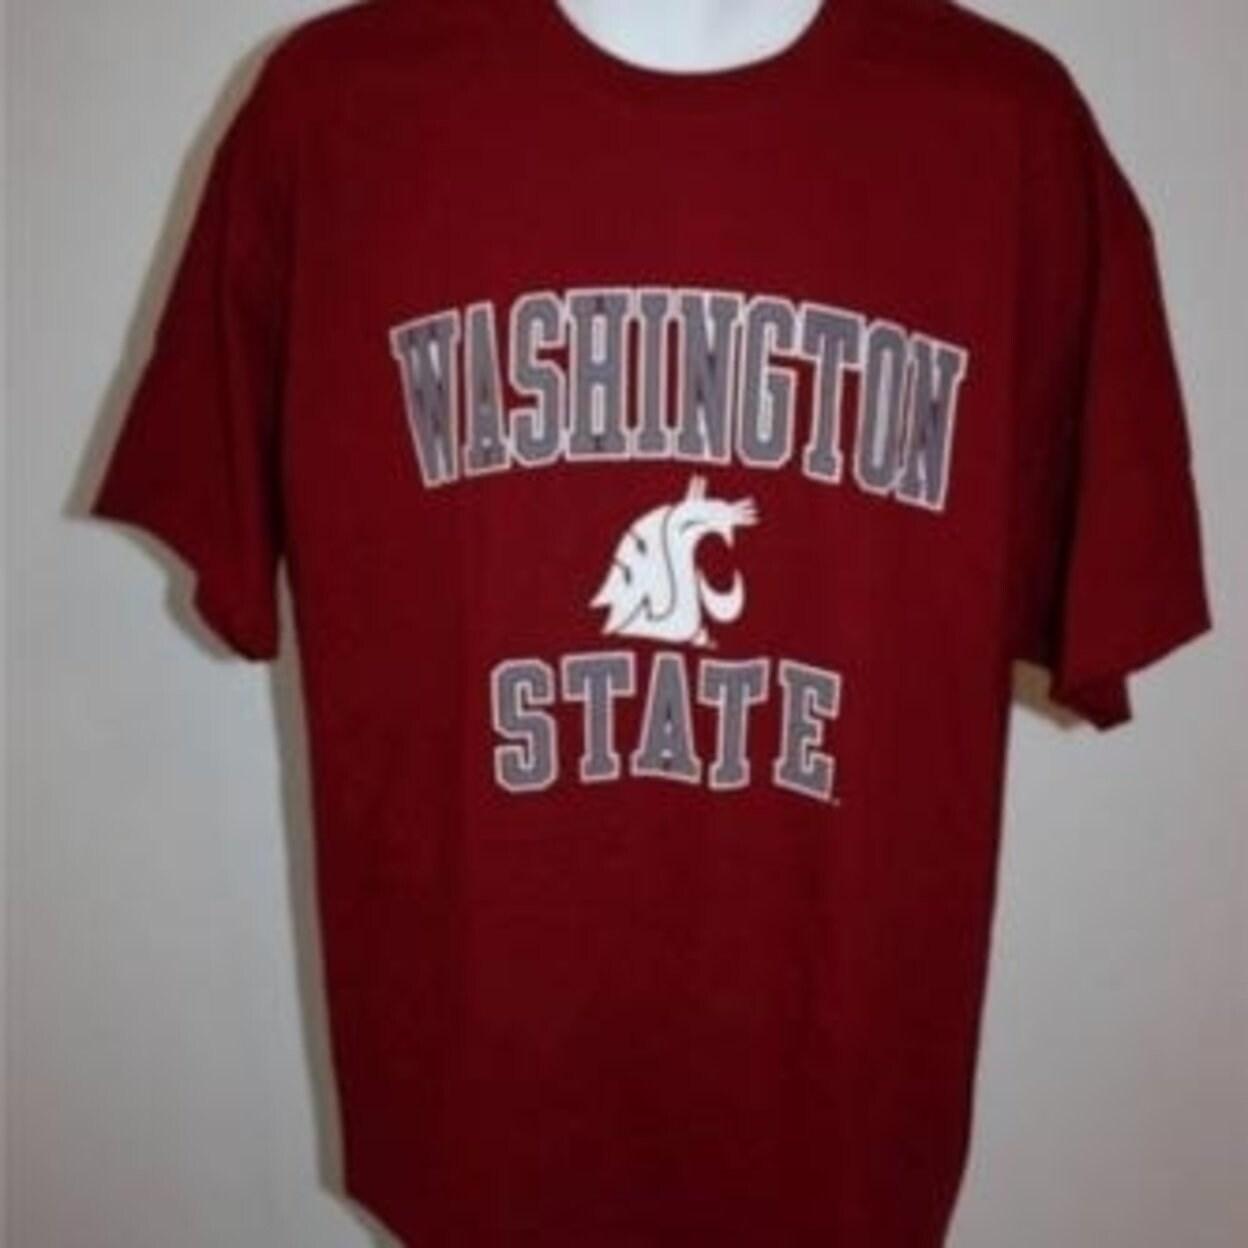 watch 7458f 7aa87 Washington State Cougars Adult sizes M-L-XL-2XL Red Shirt